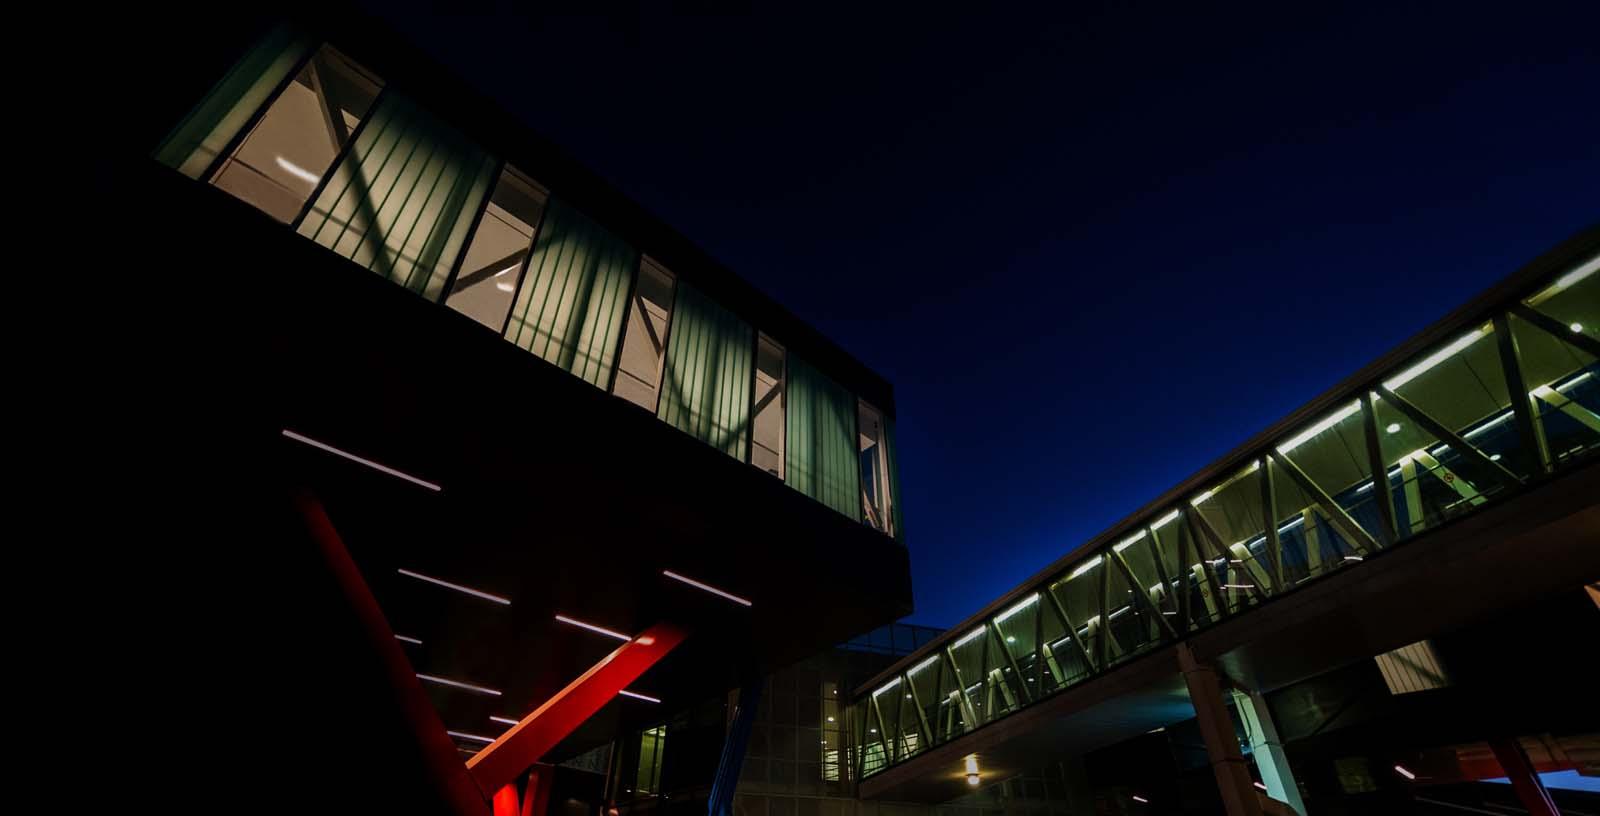 Cross-border_at_Tijuana_airport_03_Architecture_IDOM_photos_Pradip_J._Phanse